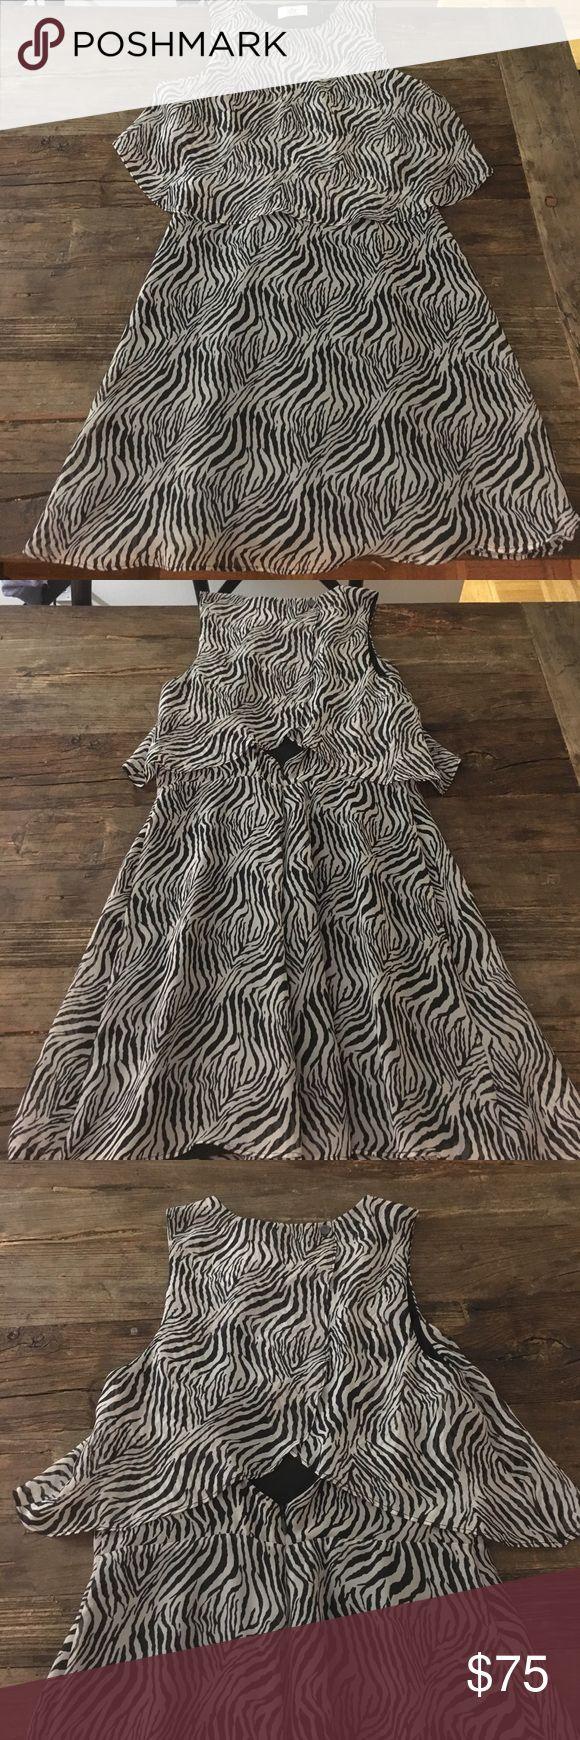 Dolce Vita zebra print dress Dolce Vita zebra print dress Dolce Vita Dresses Midi